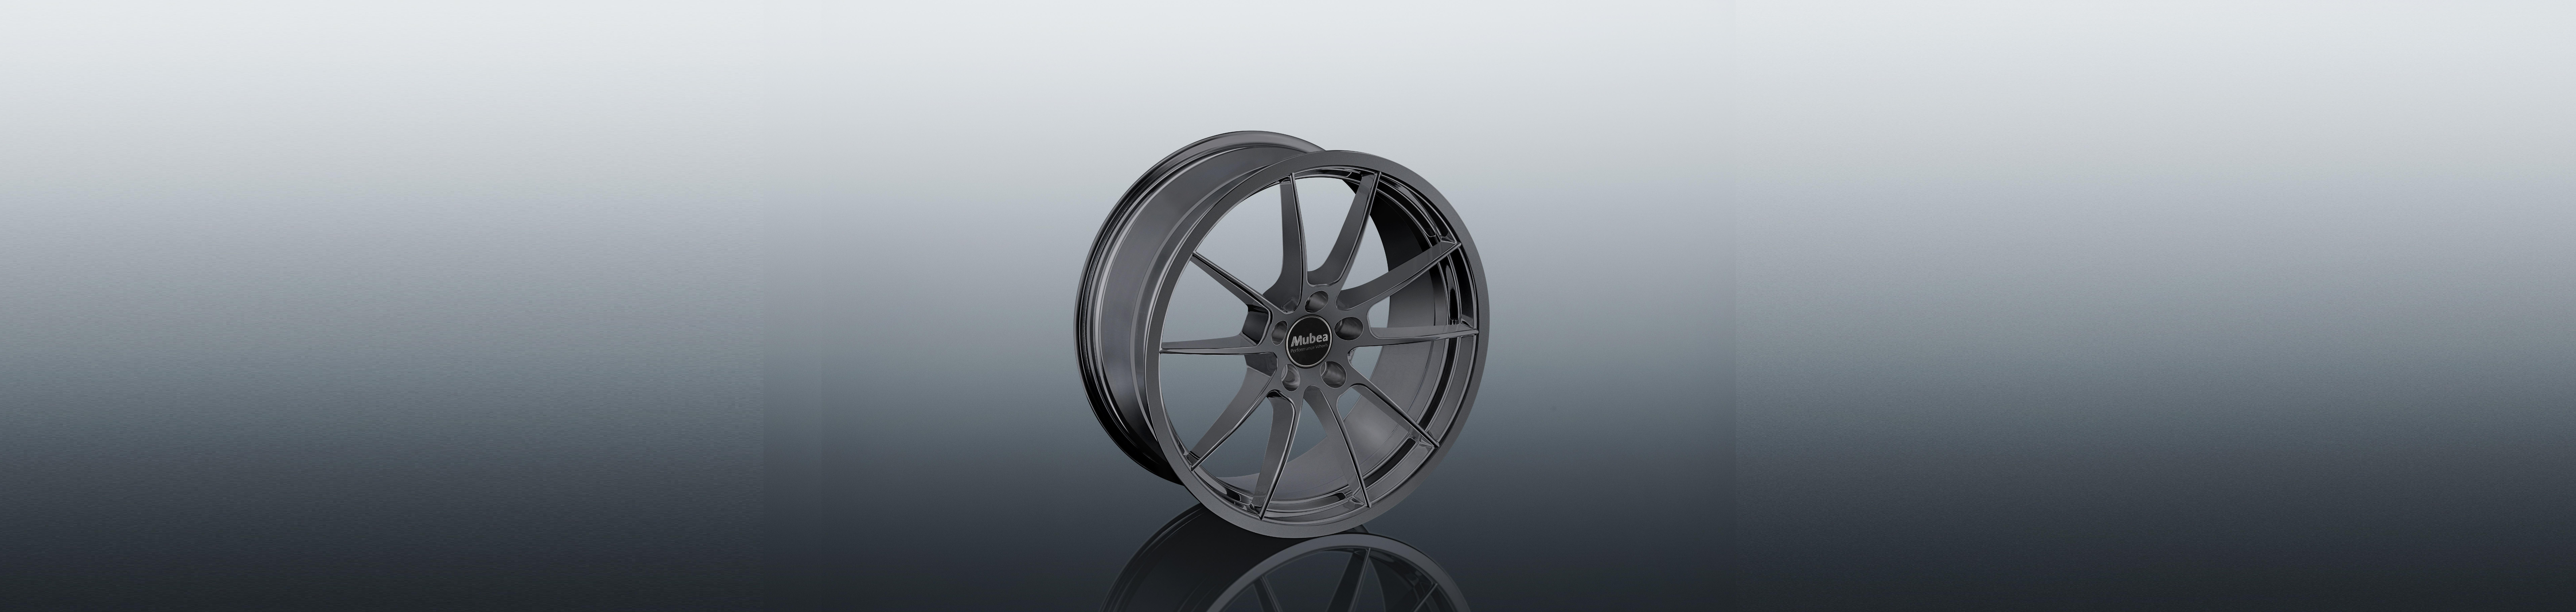 headline_peformance_wheels.jpg